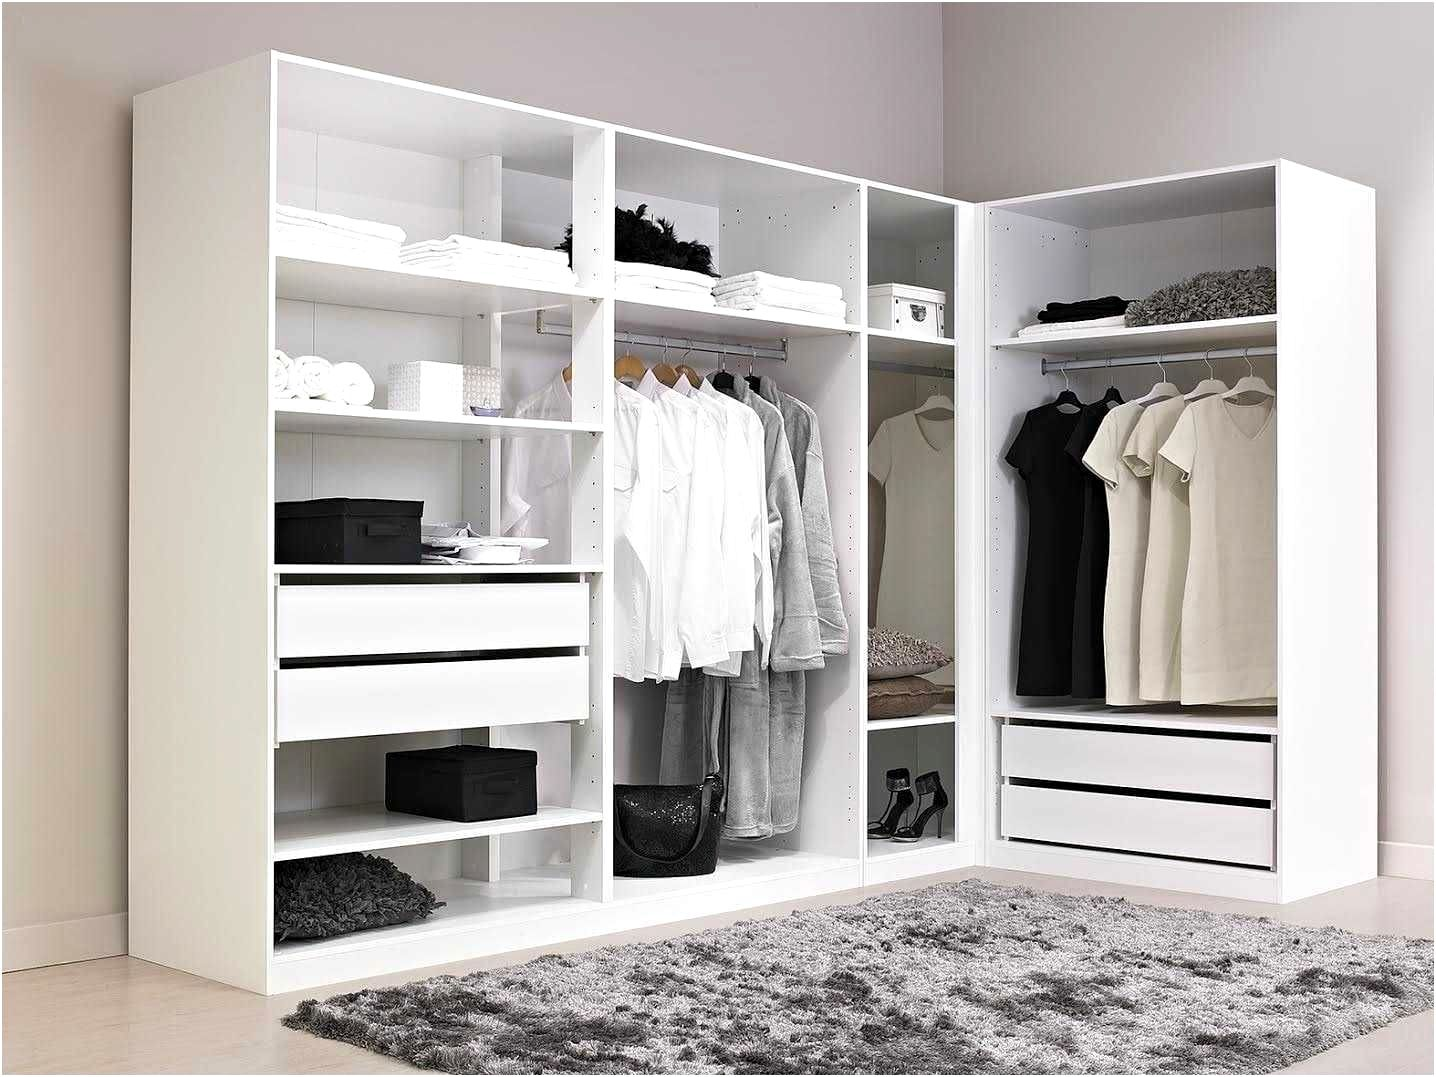 Ikea Sur Mesure Ideas Dressing Angle Amenagement Dressing Idee Dressing